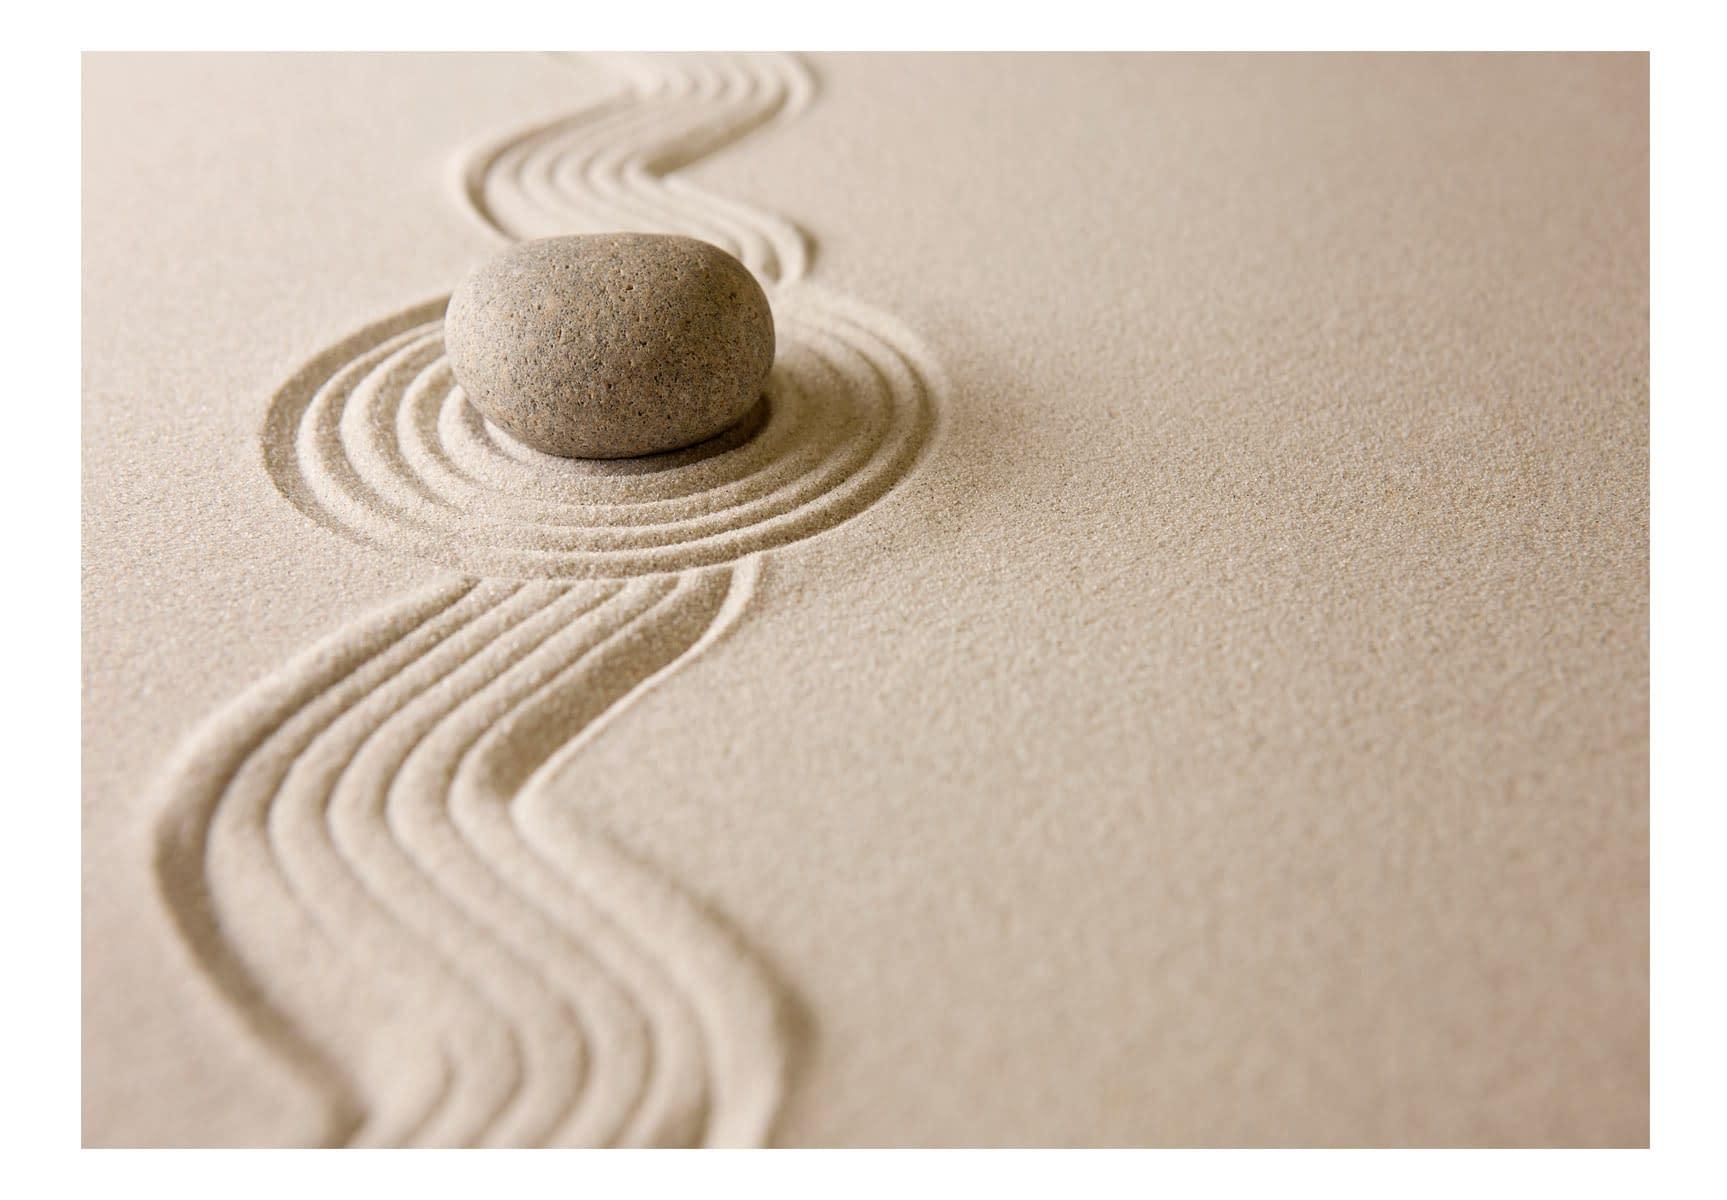 Fototapeta samoprzylepna – Zen: Równowaga